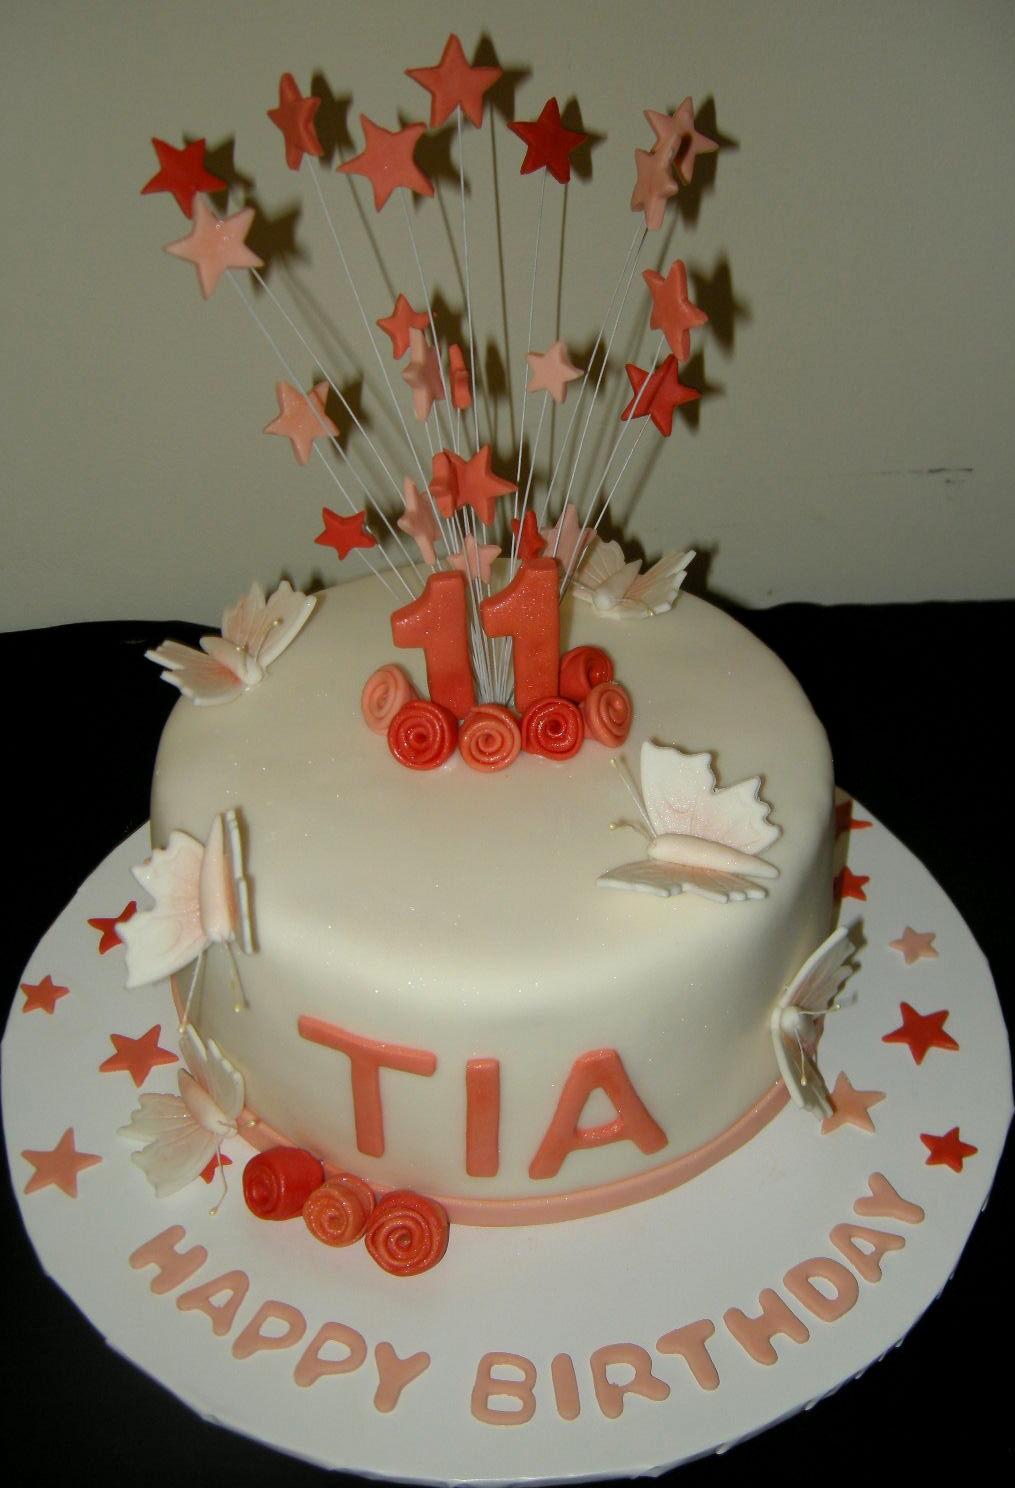 Harshis Cakes Bakes Tias 11th Birthday Cake